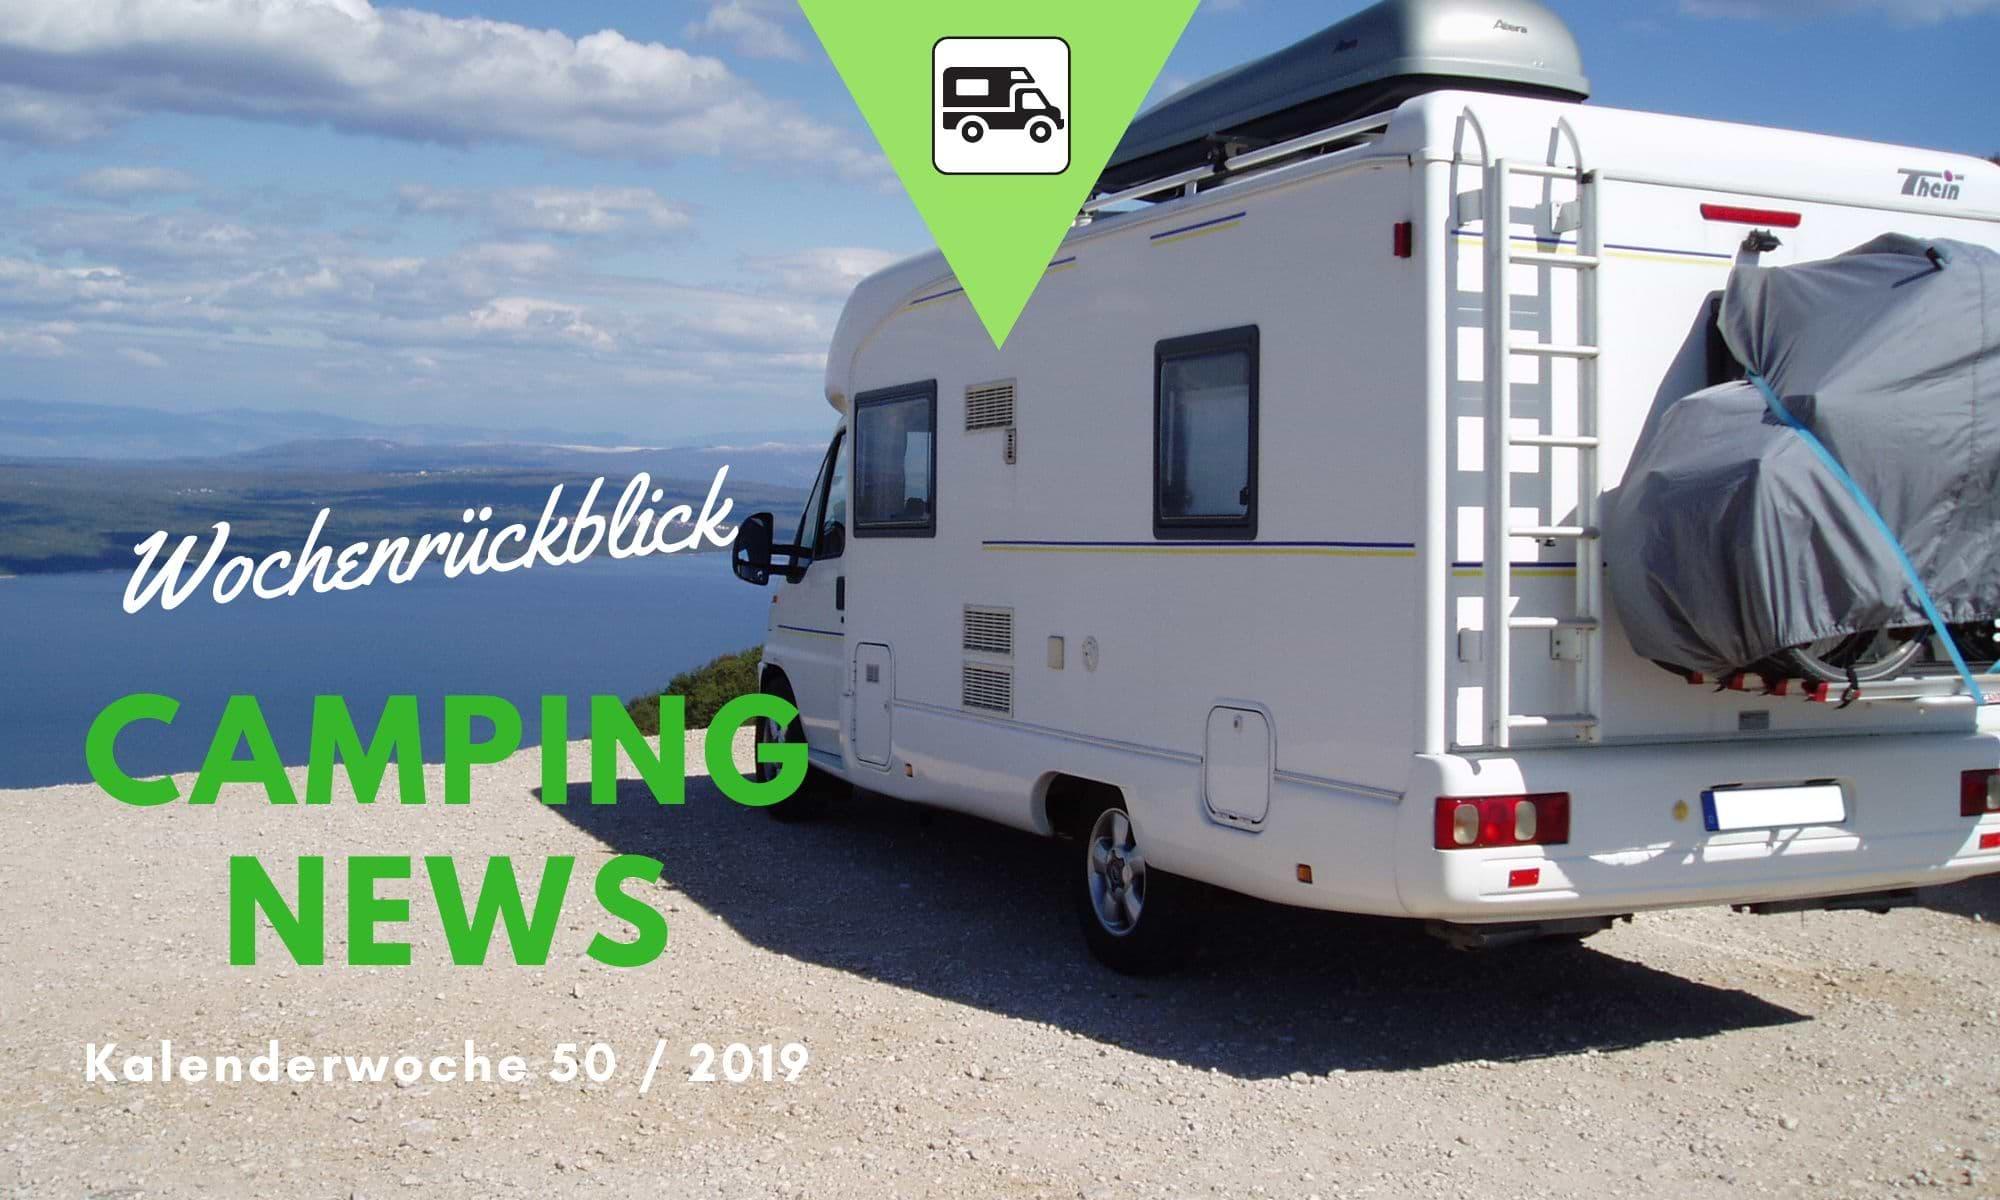 Wochenrückblick Camping News KW50-2019